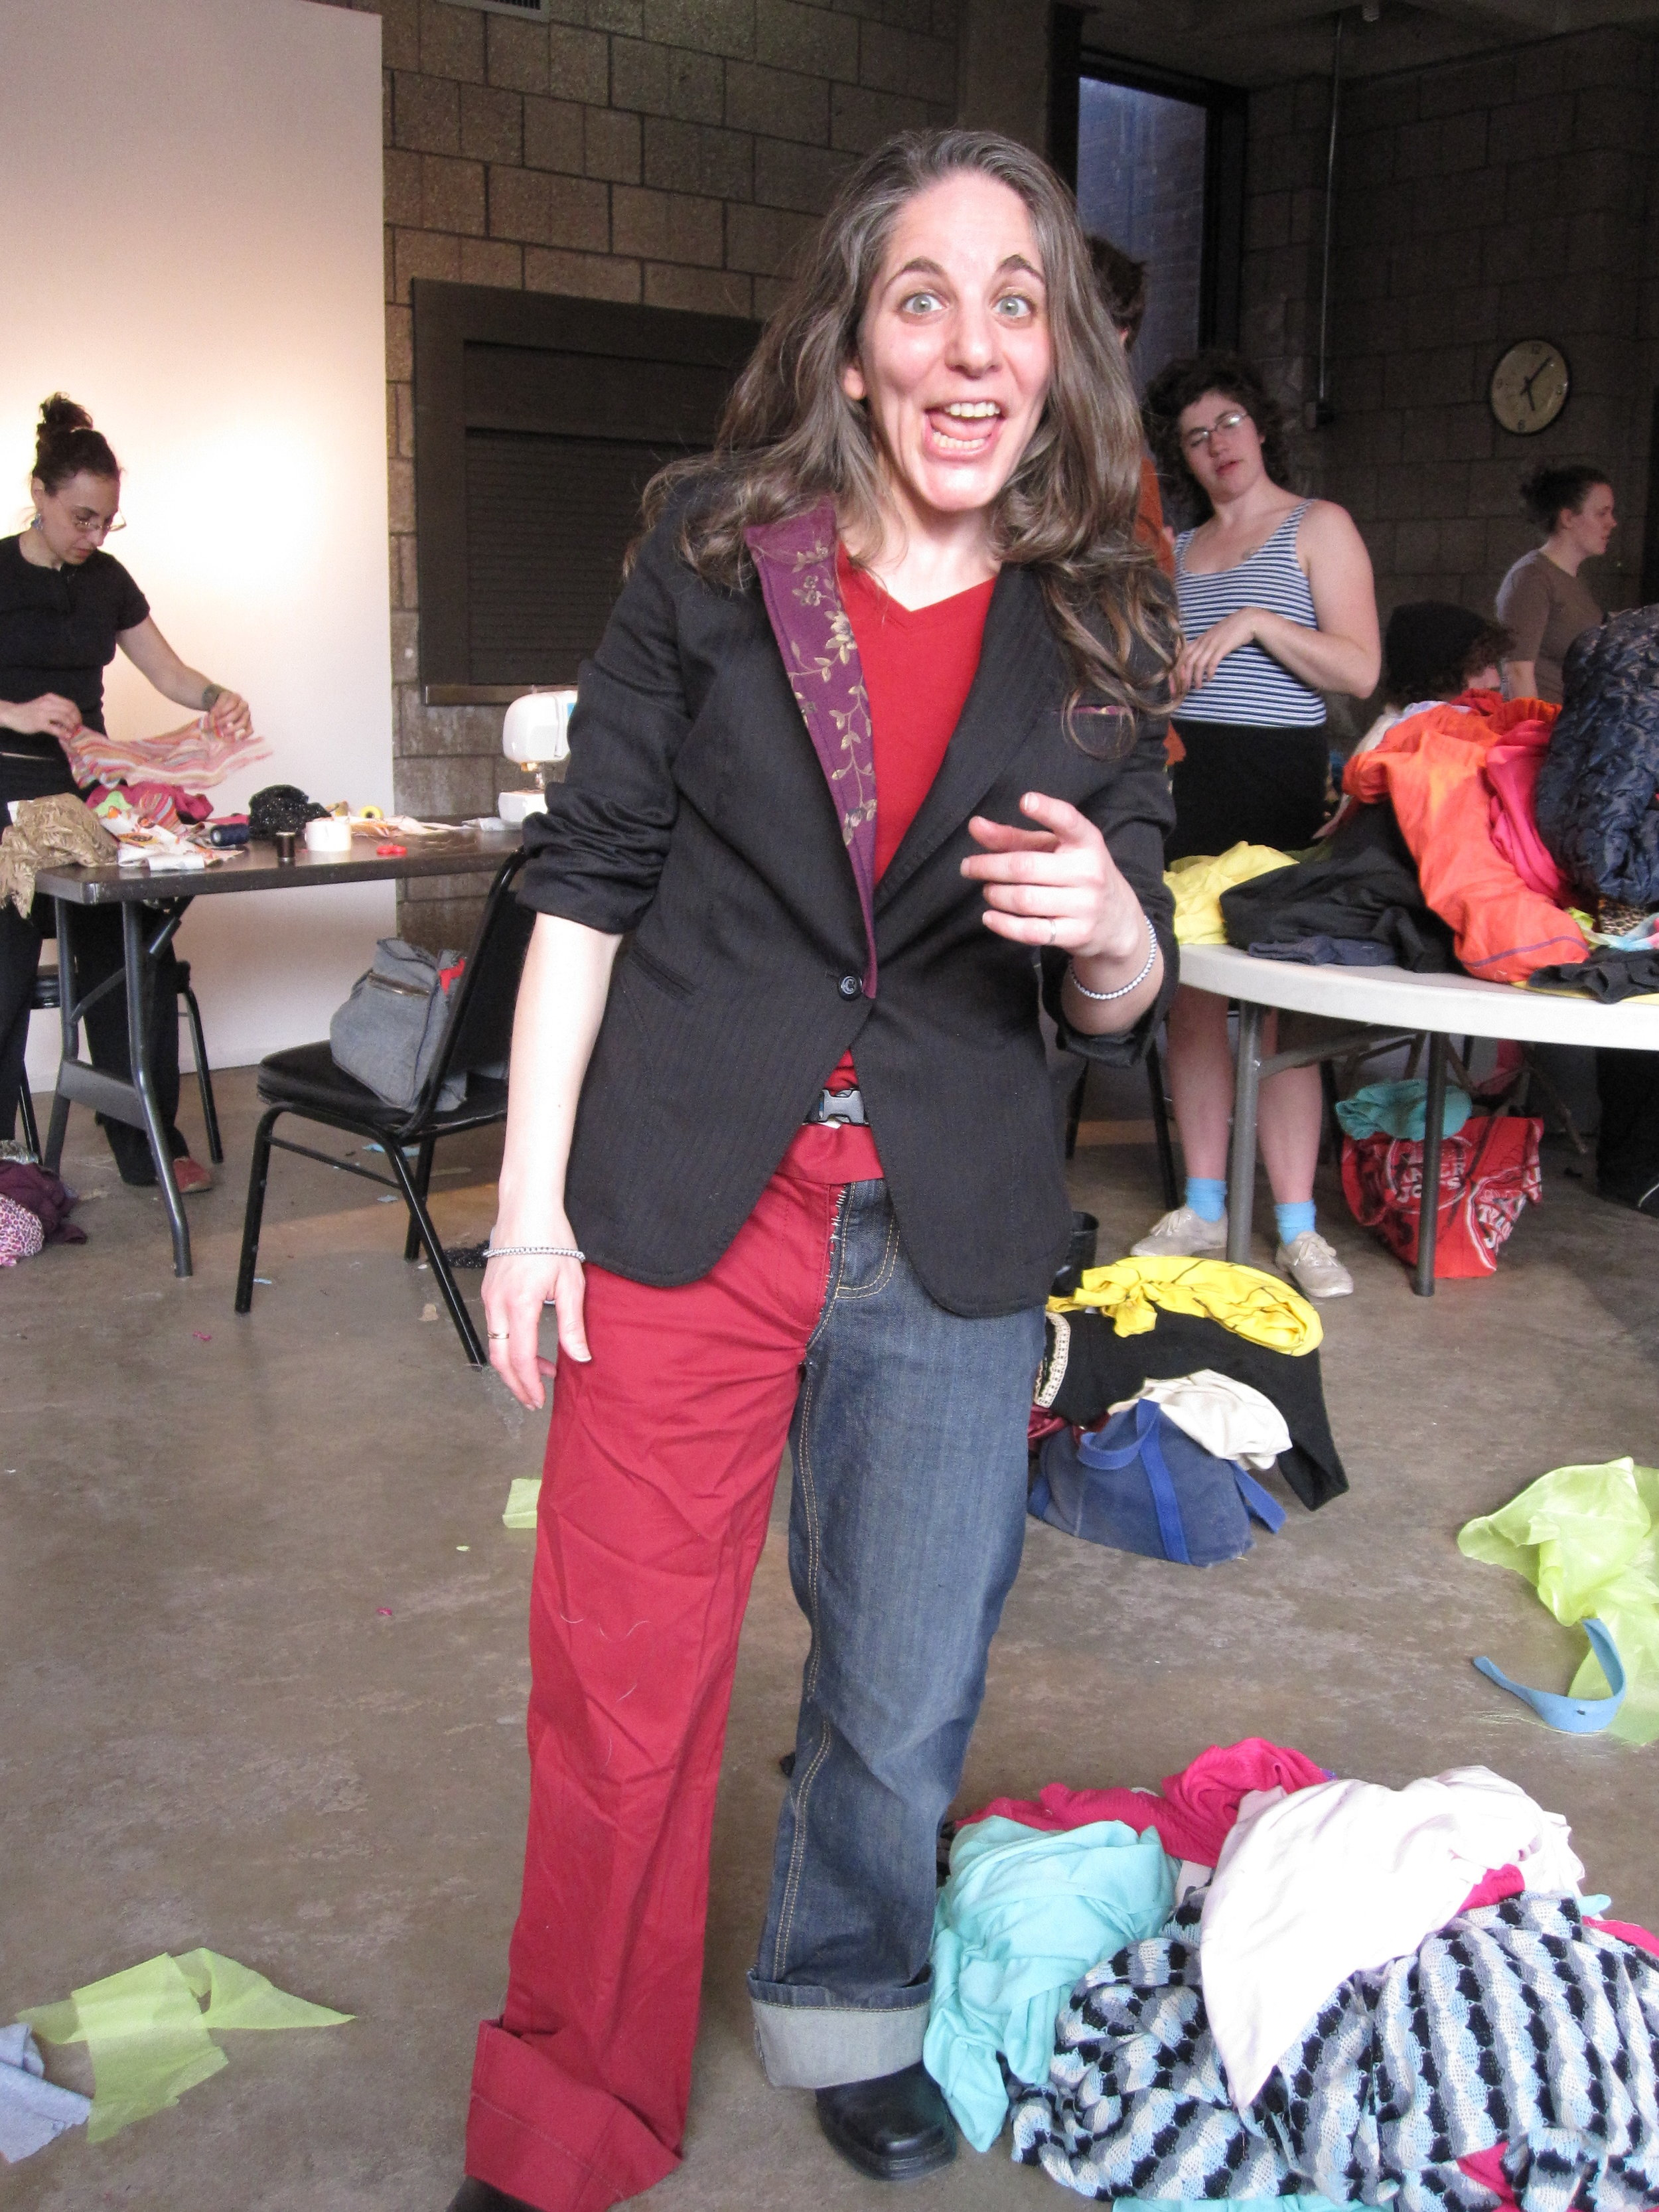 clothing-remake-marathon_4459522625_o.jpg